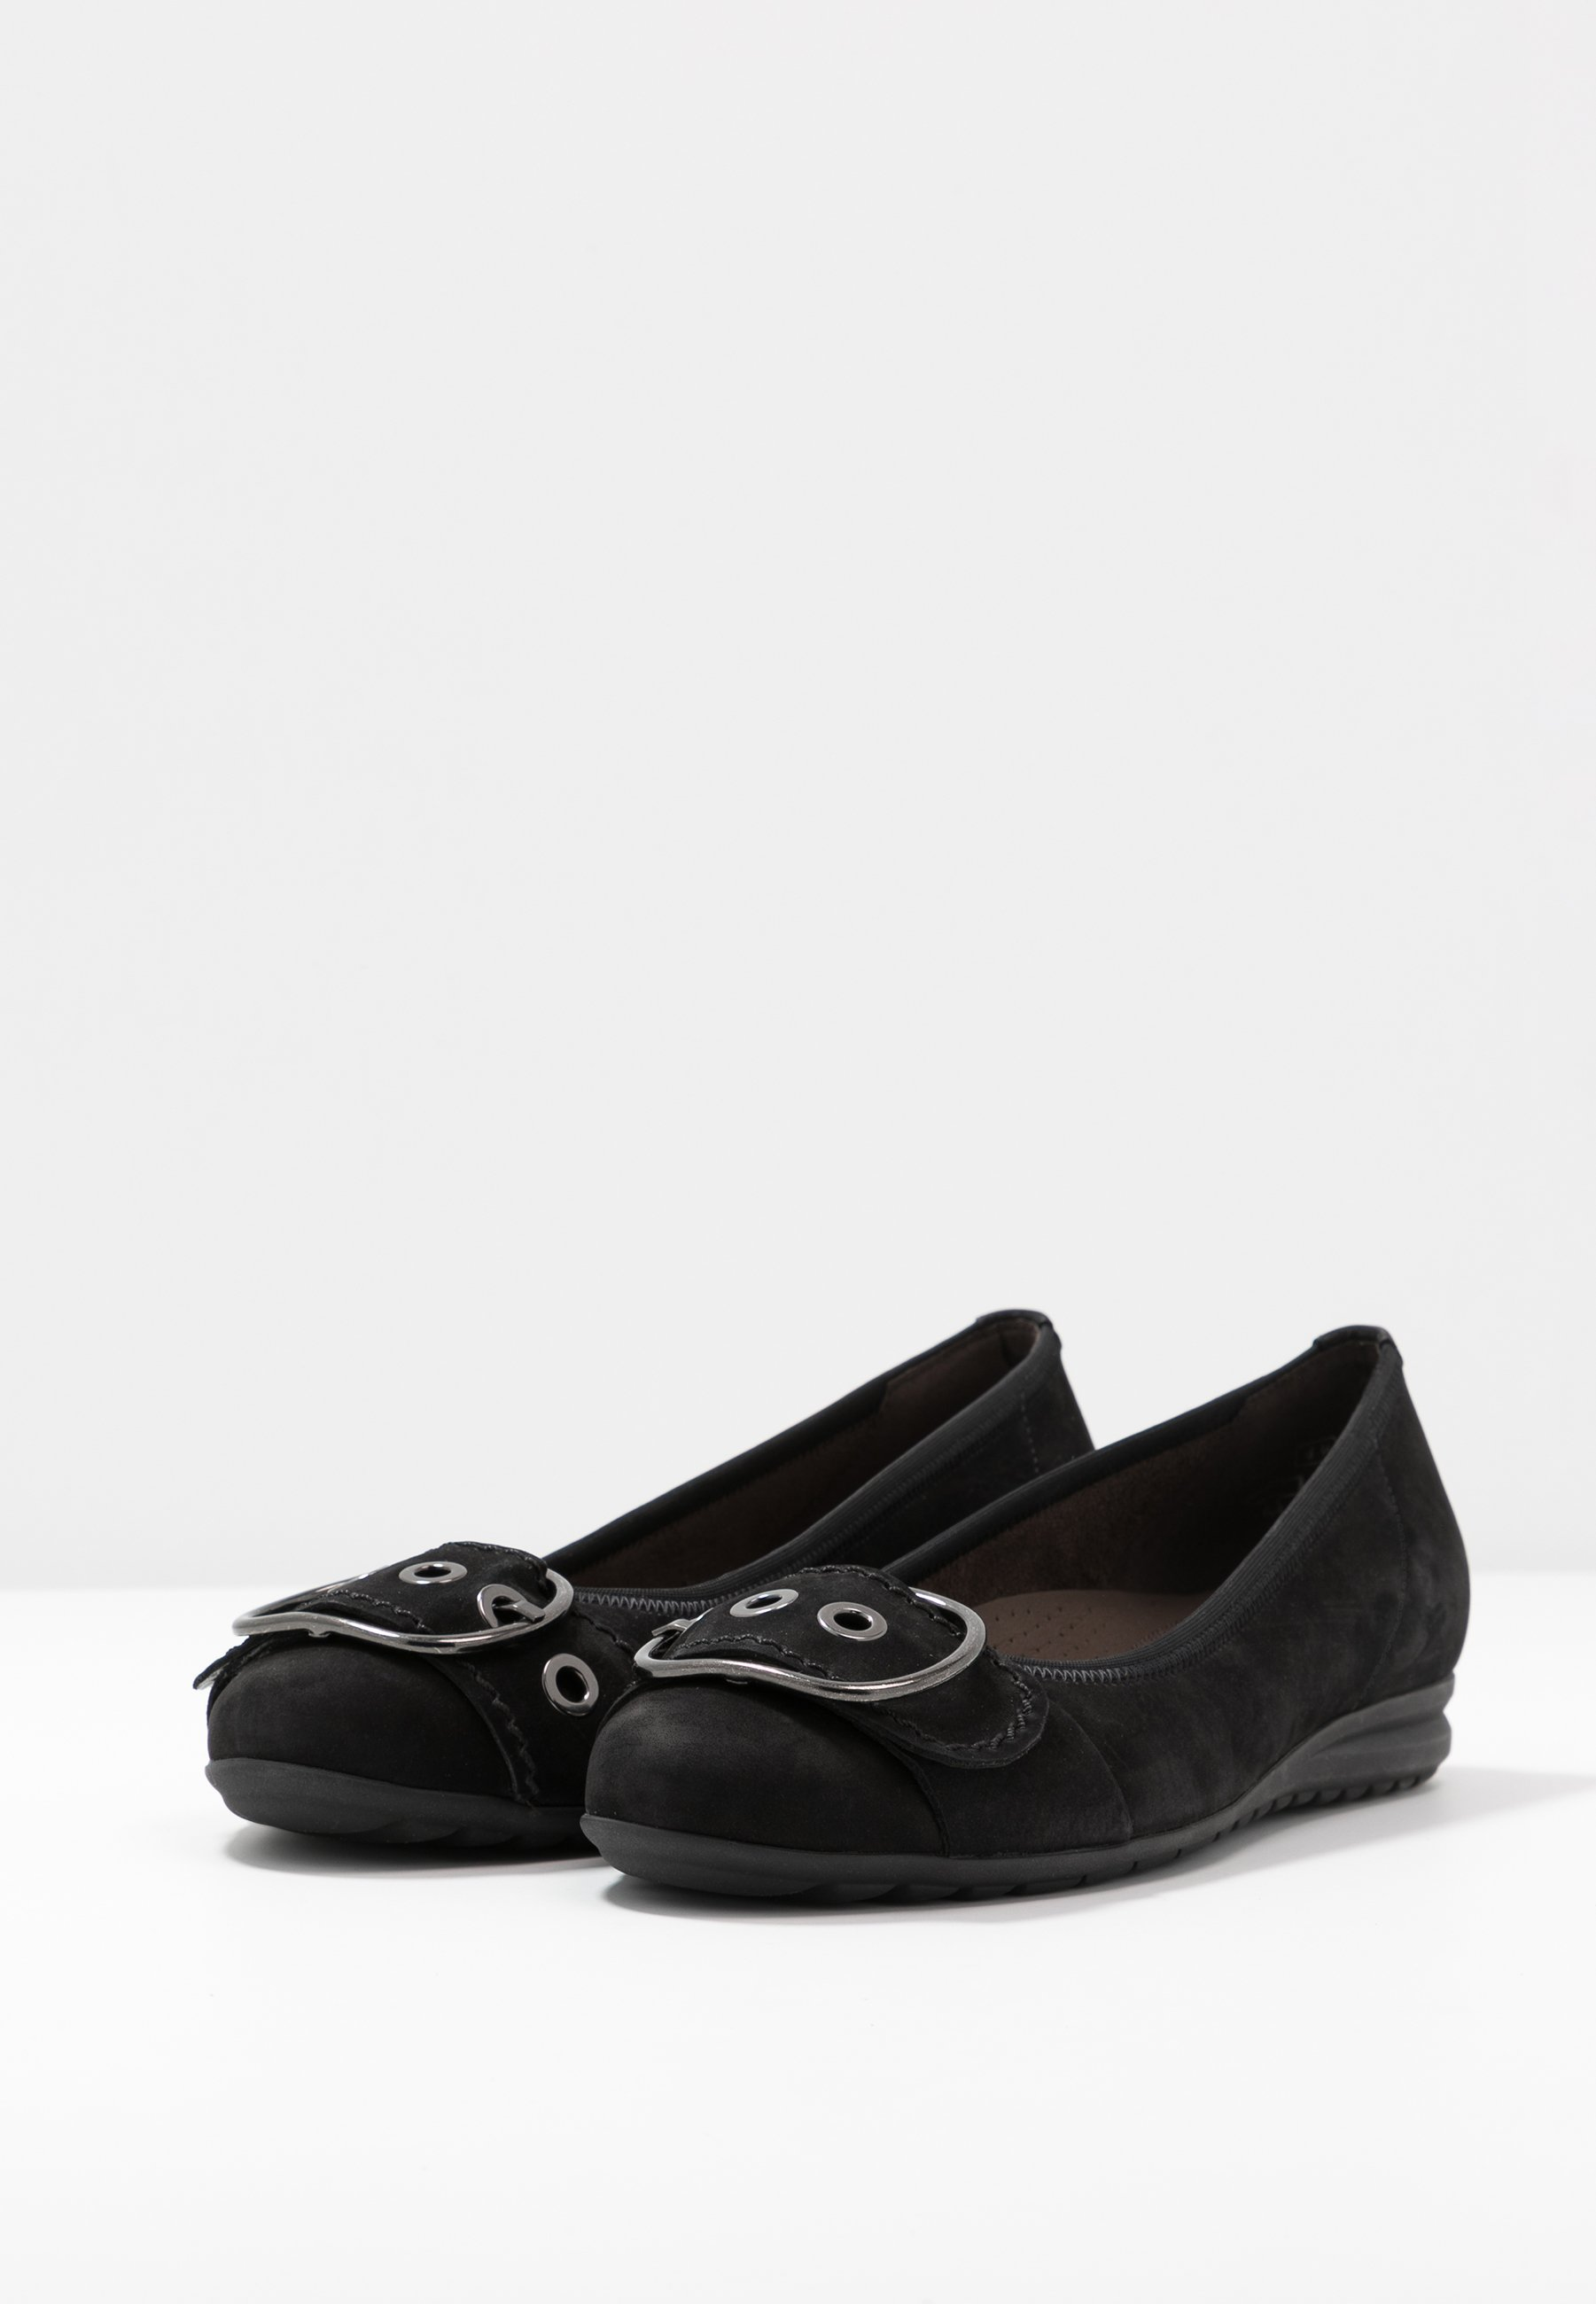 Gabor Comfort Ballerina - Schwarz/svart